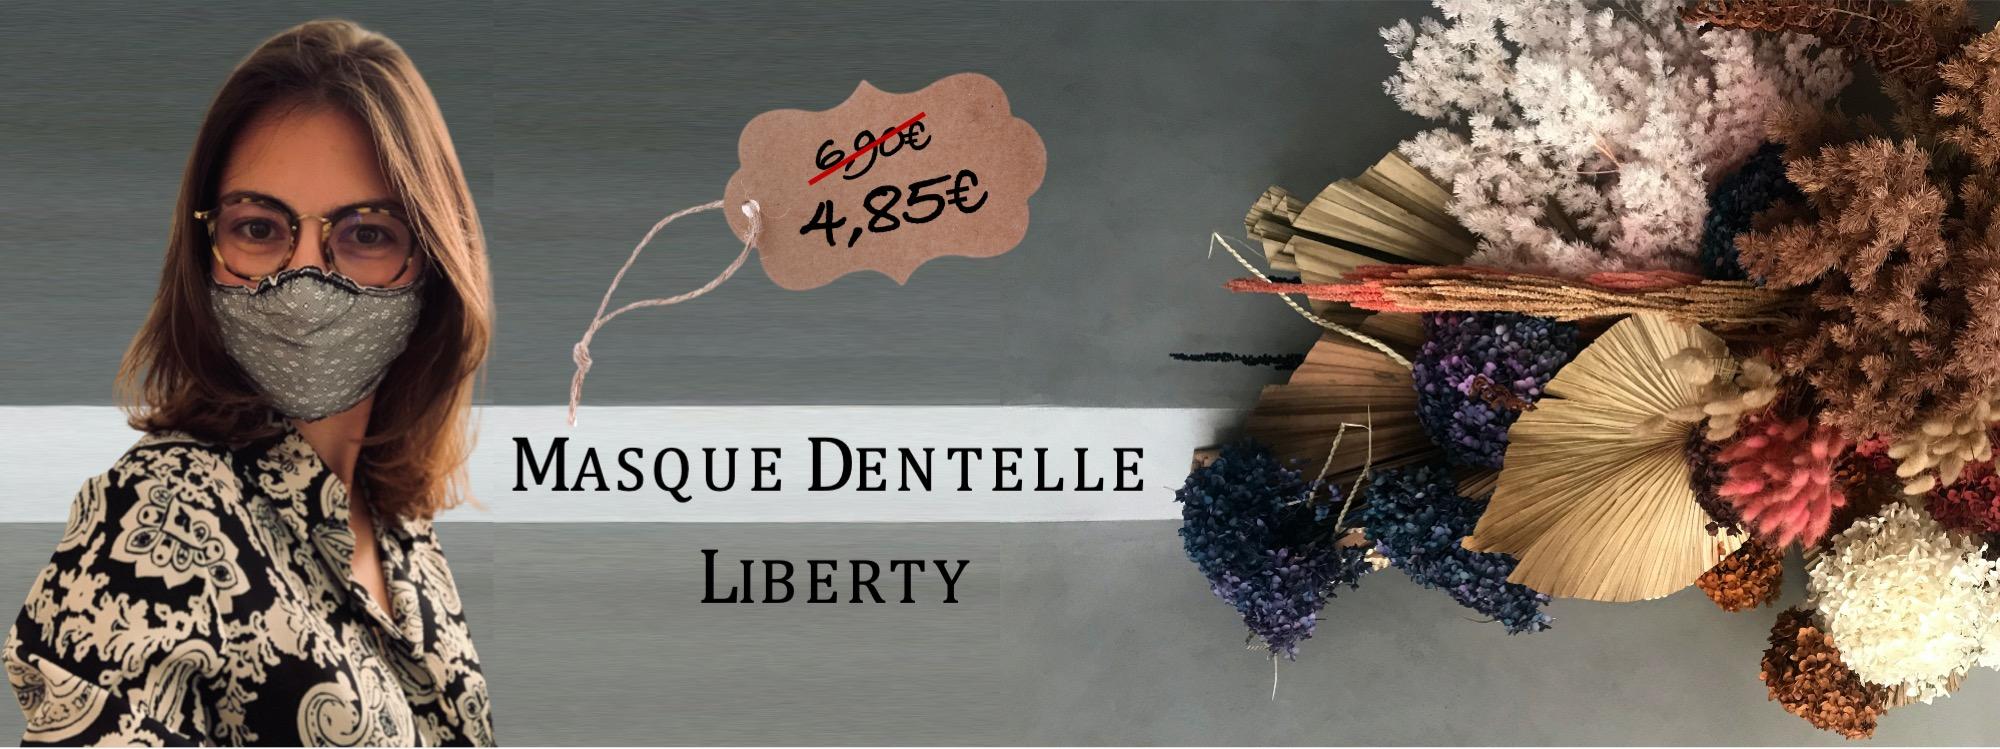 masque-promo-liberty